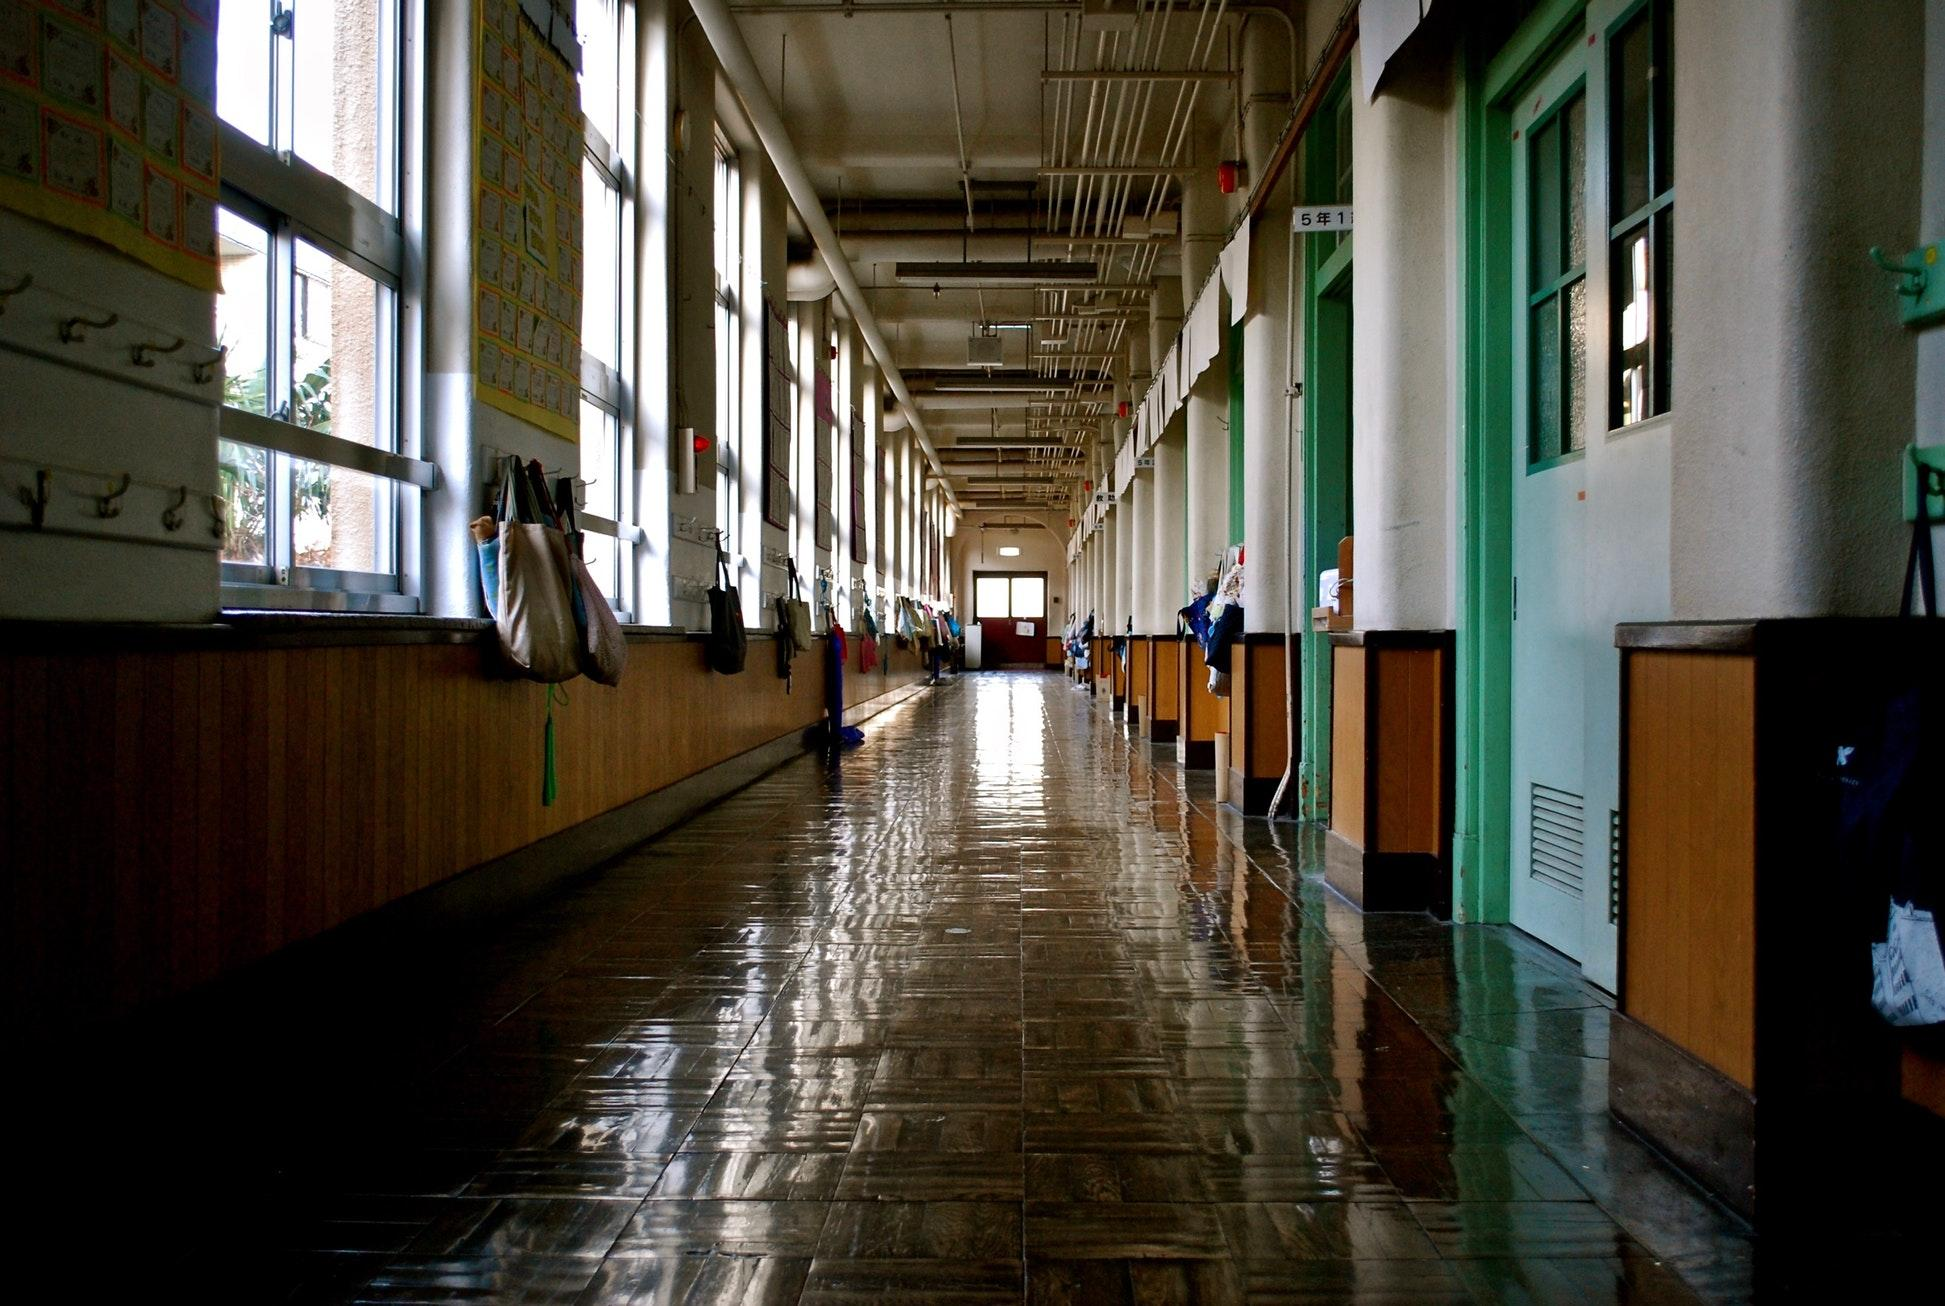 7 Ways to Reduce Waste at School